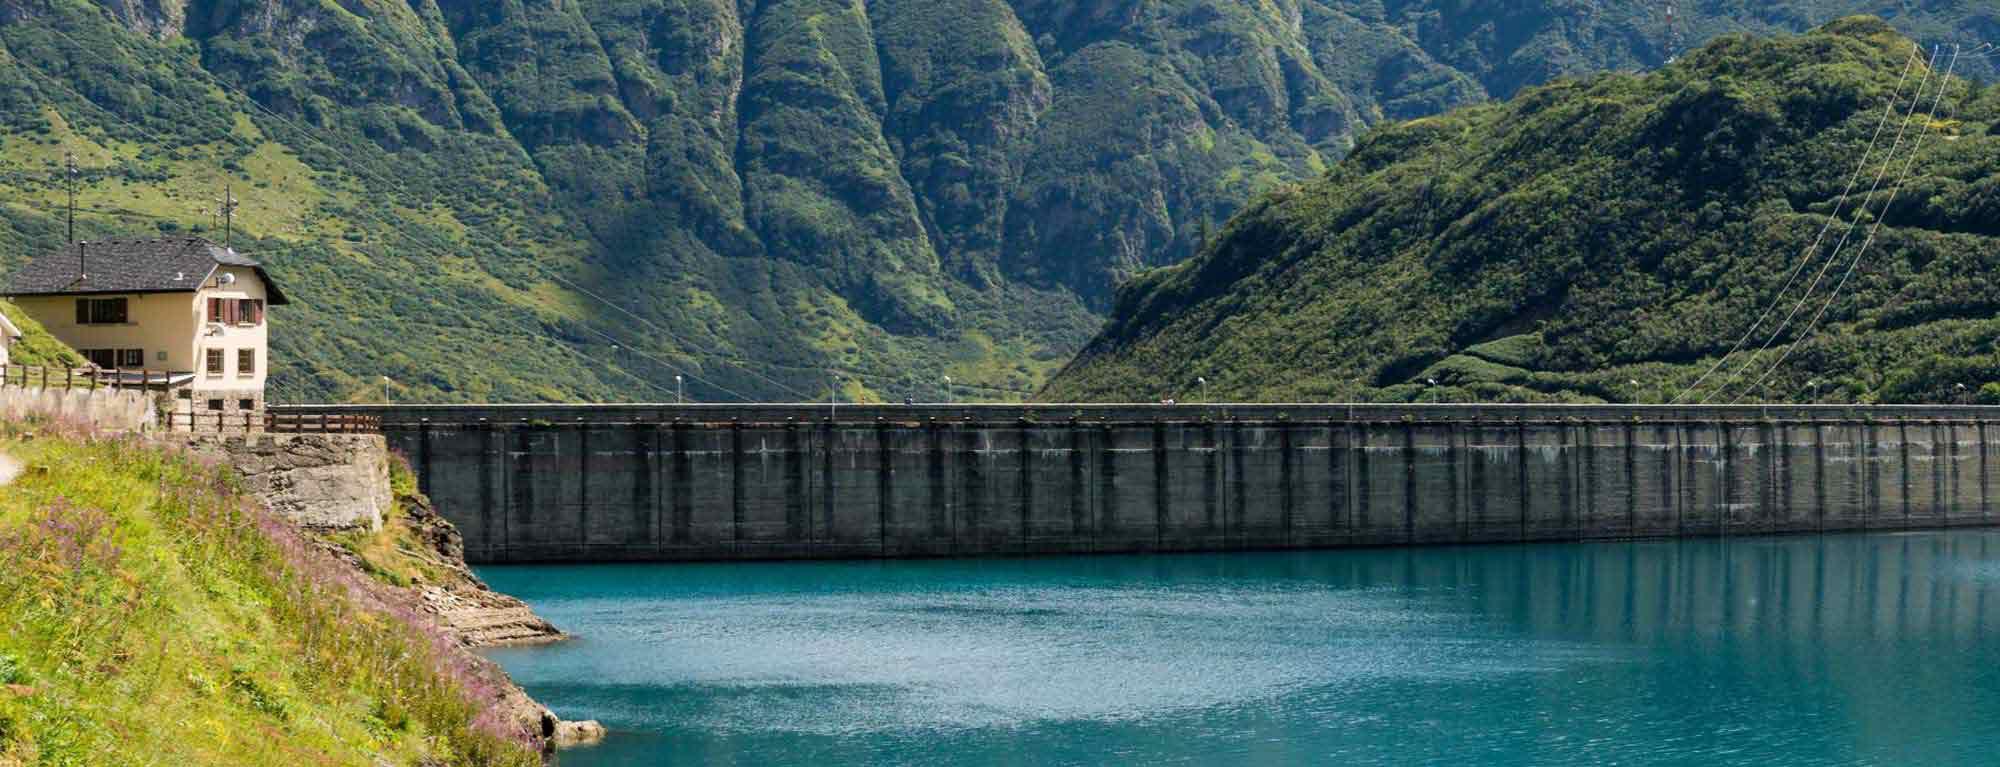 Dam of a hydroelectric reservoir